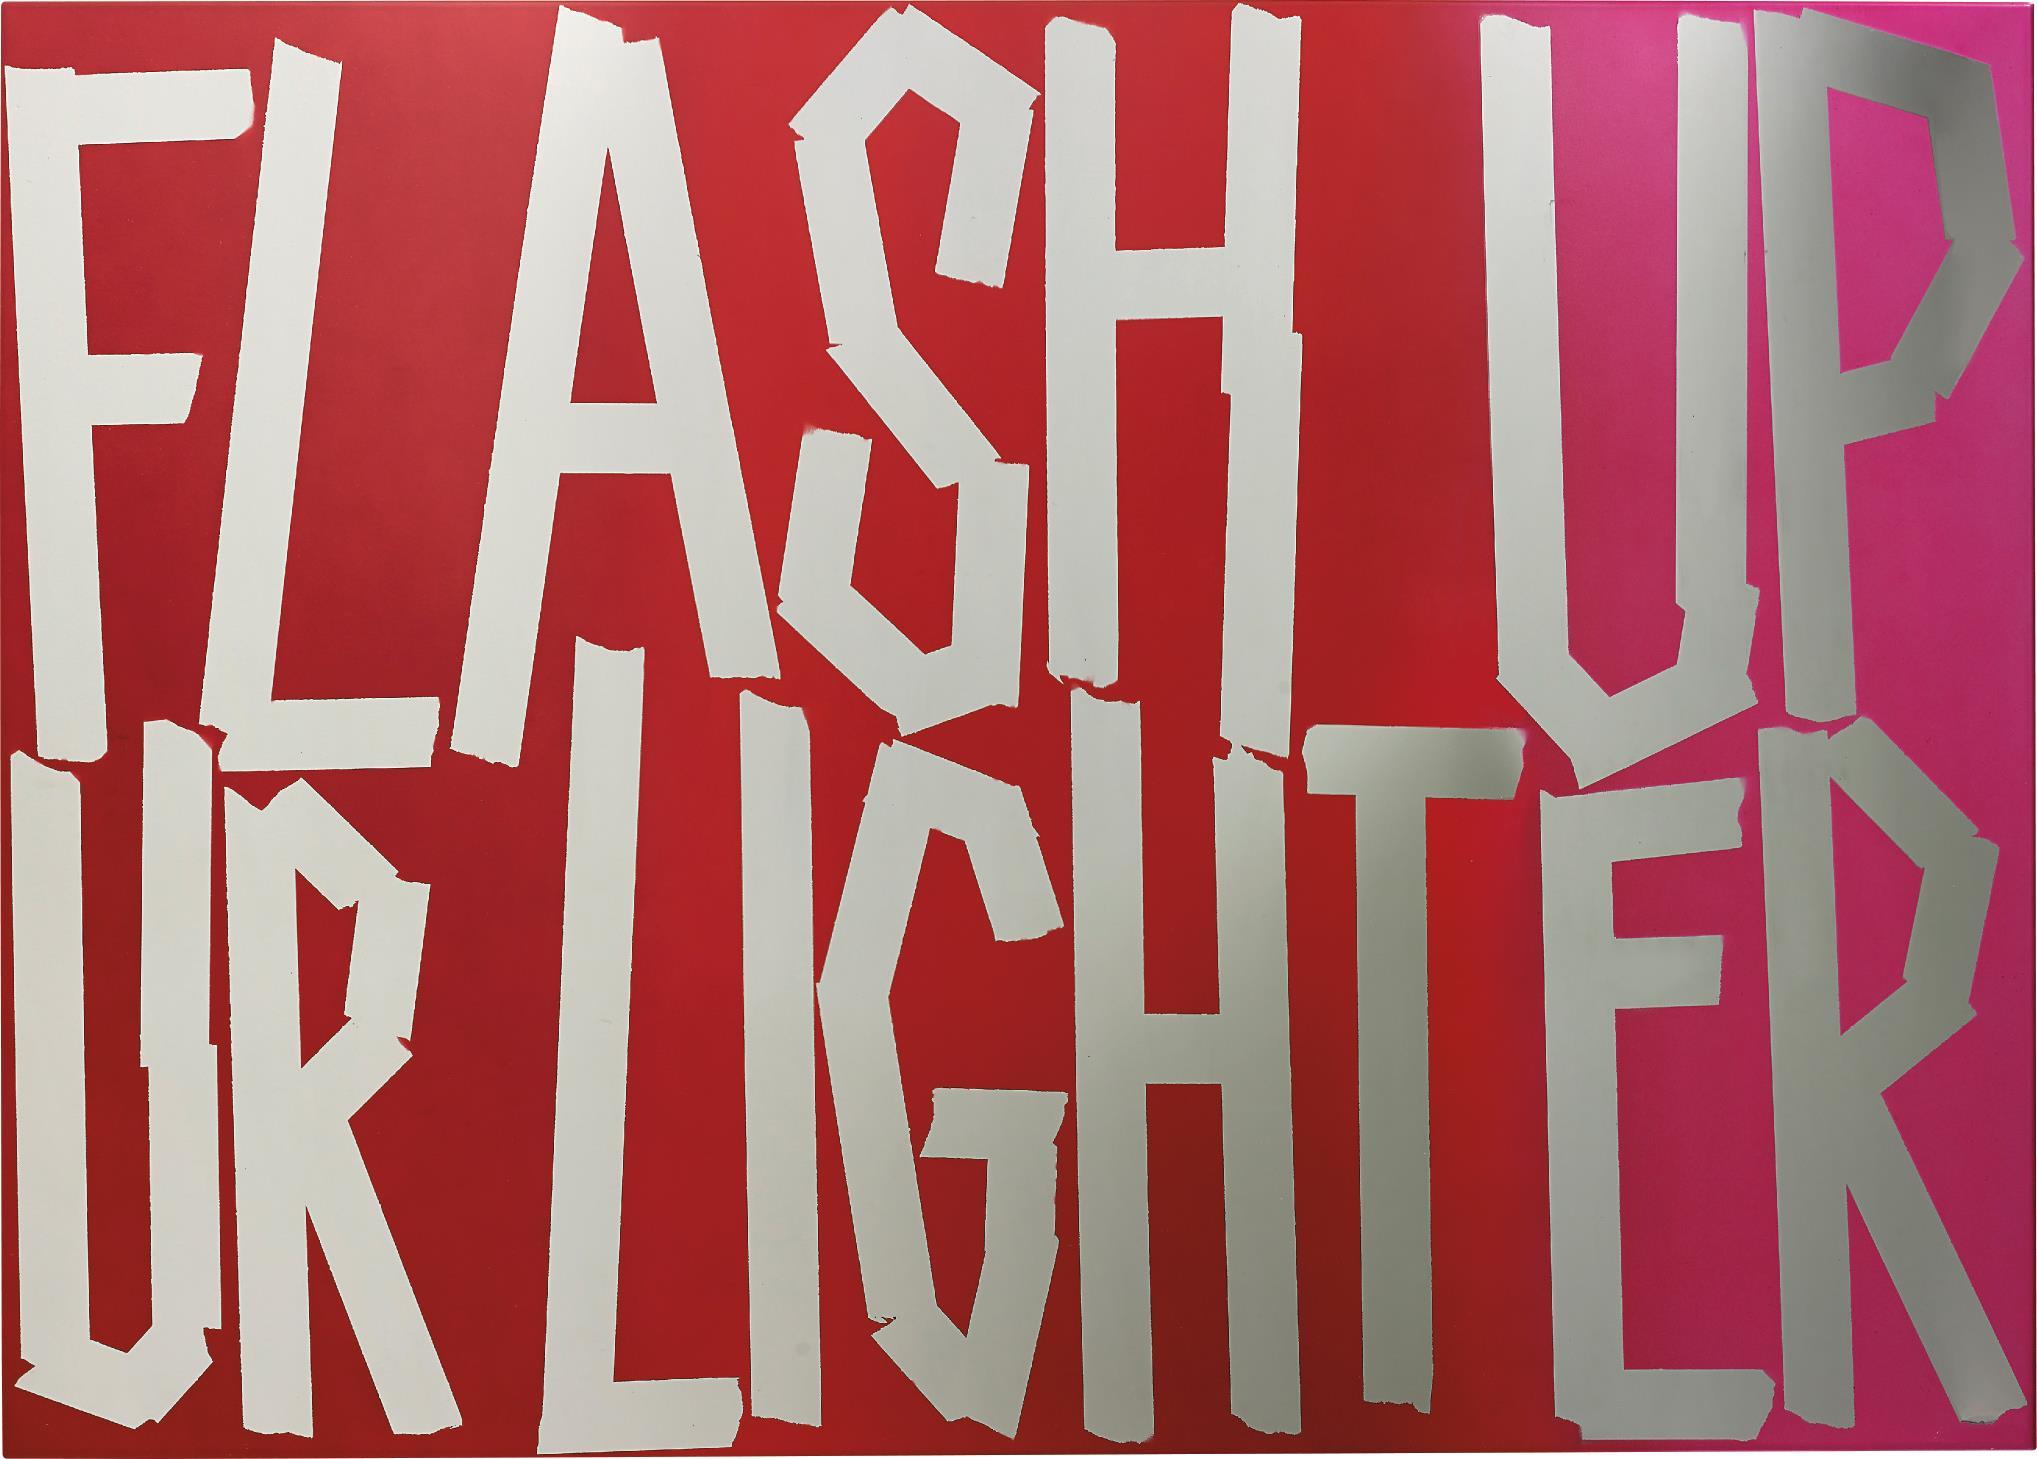 Eddie Peake-Flash Up Your Lighter-2013